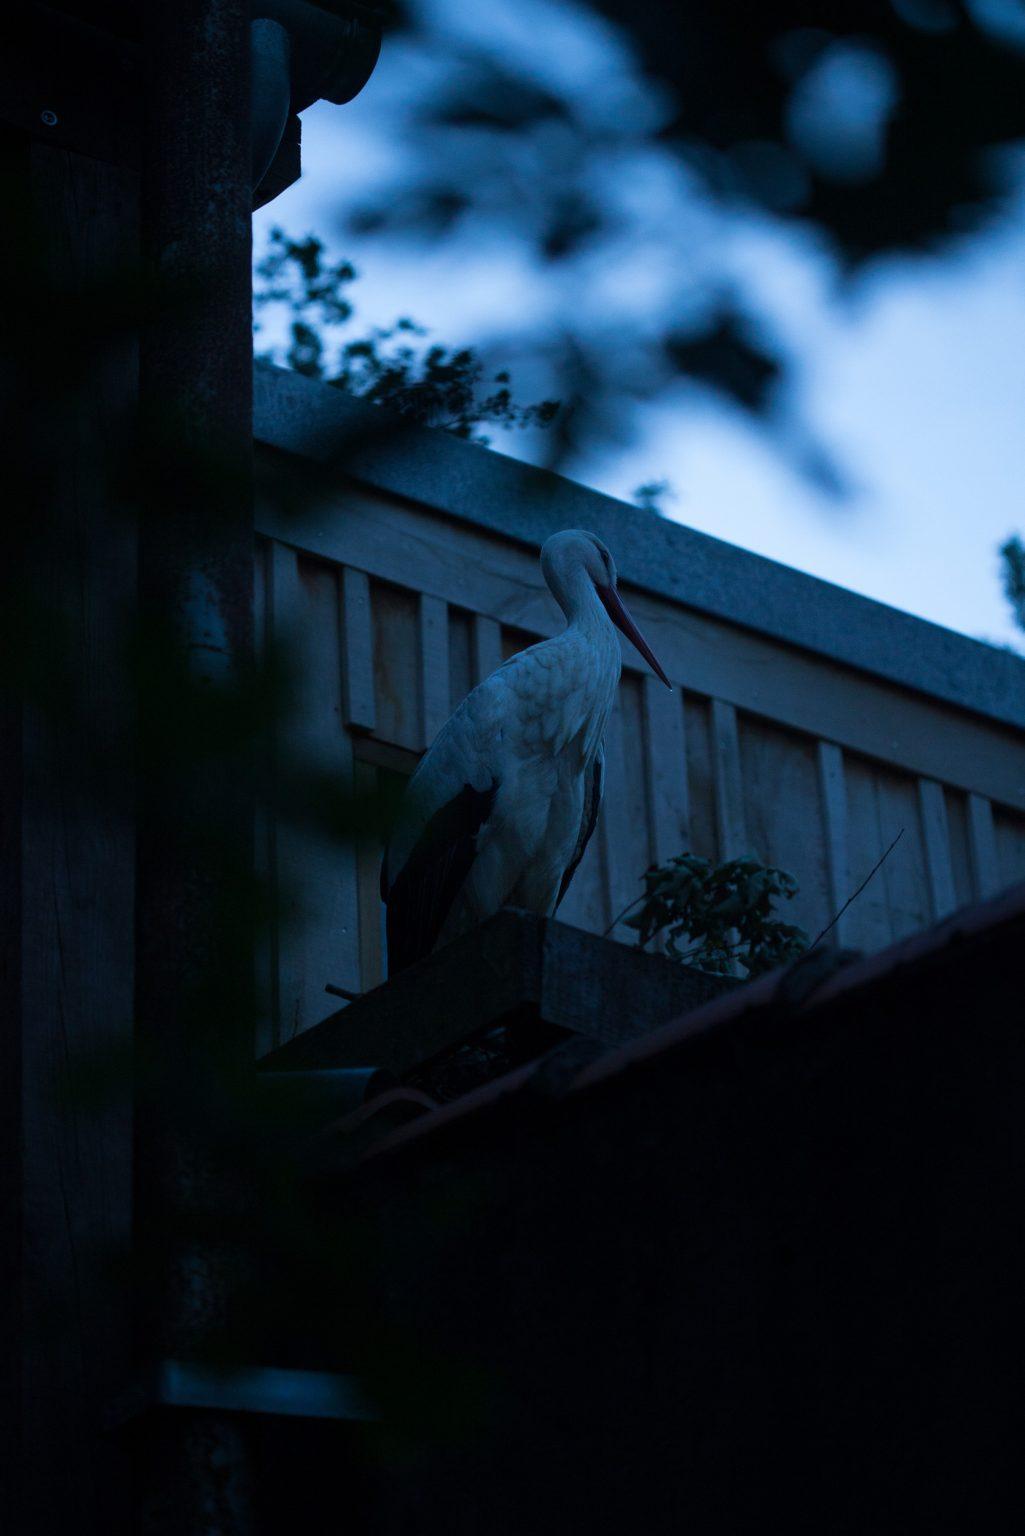 Valdivienne, France, May 2019 - The white stork Mildred at nightfall in her new nest on the roof. ><  Valdivienne, Francia, maggio 2019 - La cicogna bianca Mildred al calar della notte nel suo nuovo nido sul tetto.*** SPECIAL   FEE   APPLIES *** *** Local Caption *** 01489328